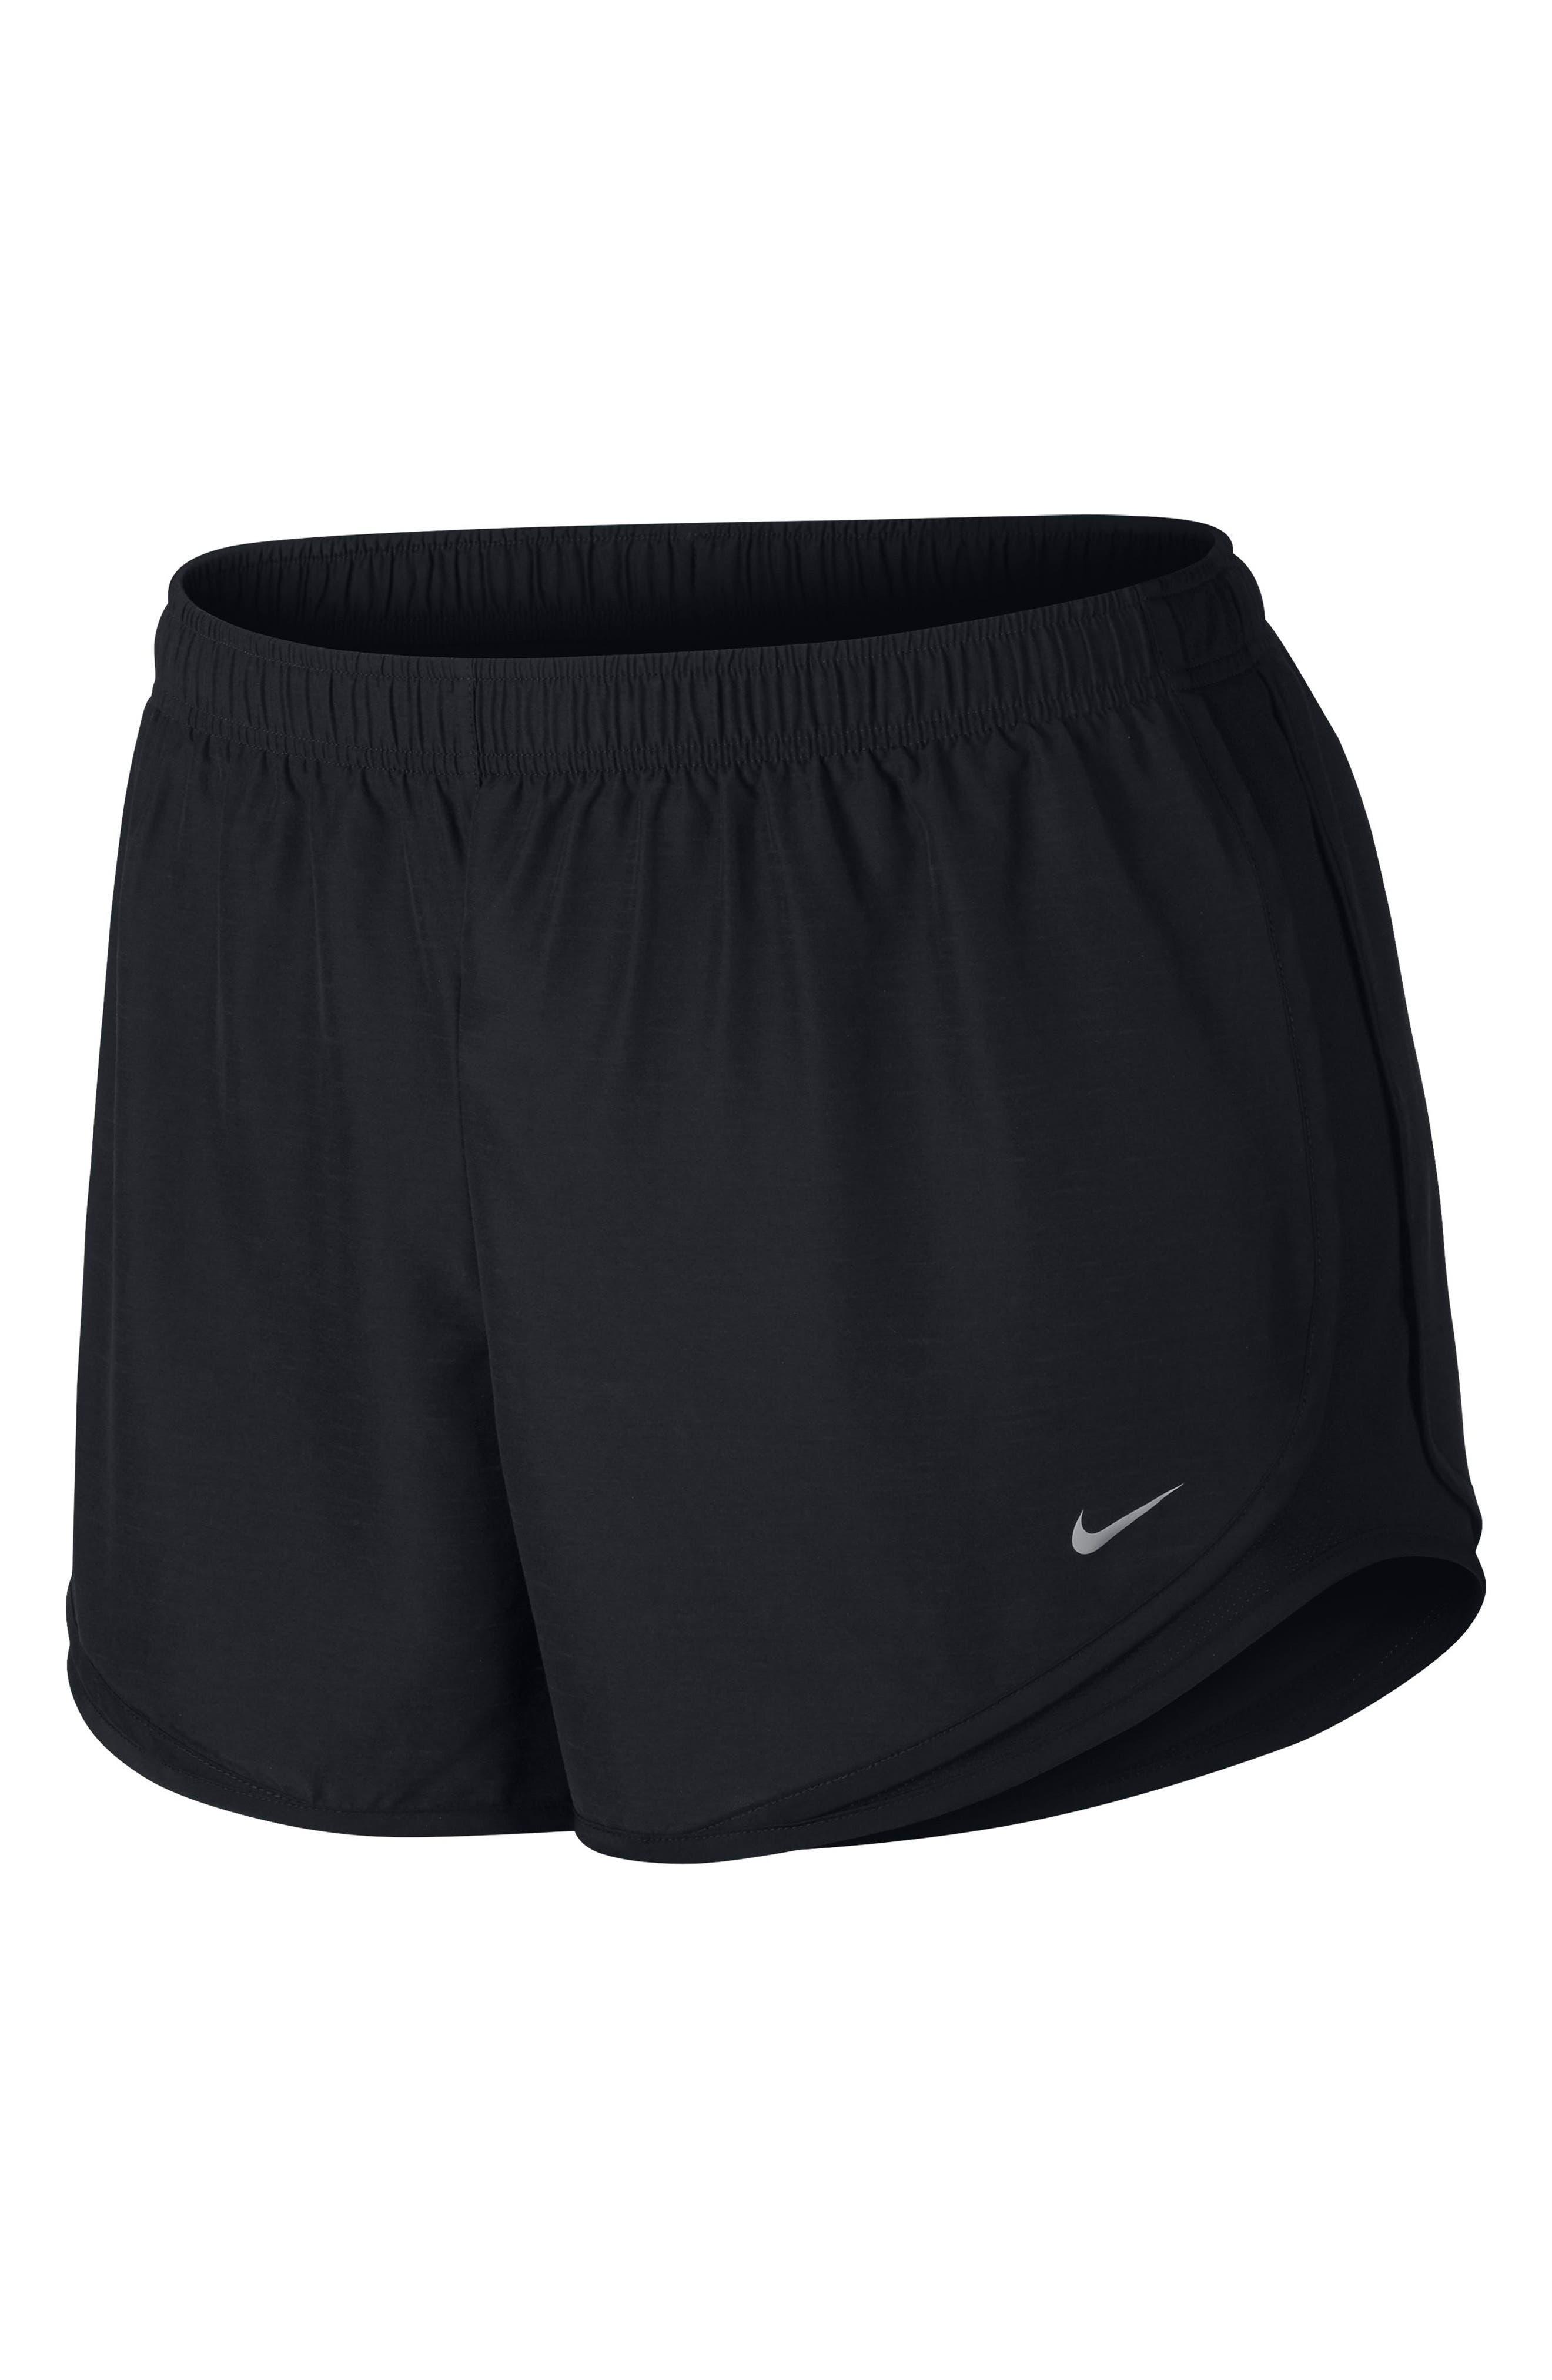 Dry Tempo Running Shorts,                             Main thumbnail 1, color,                             BLACK/ BLACK/ WOLF GREY